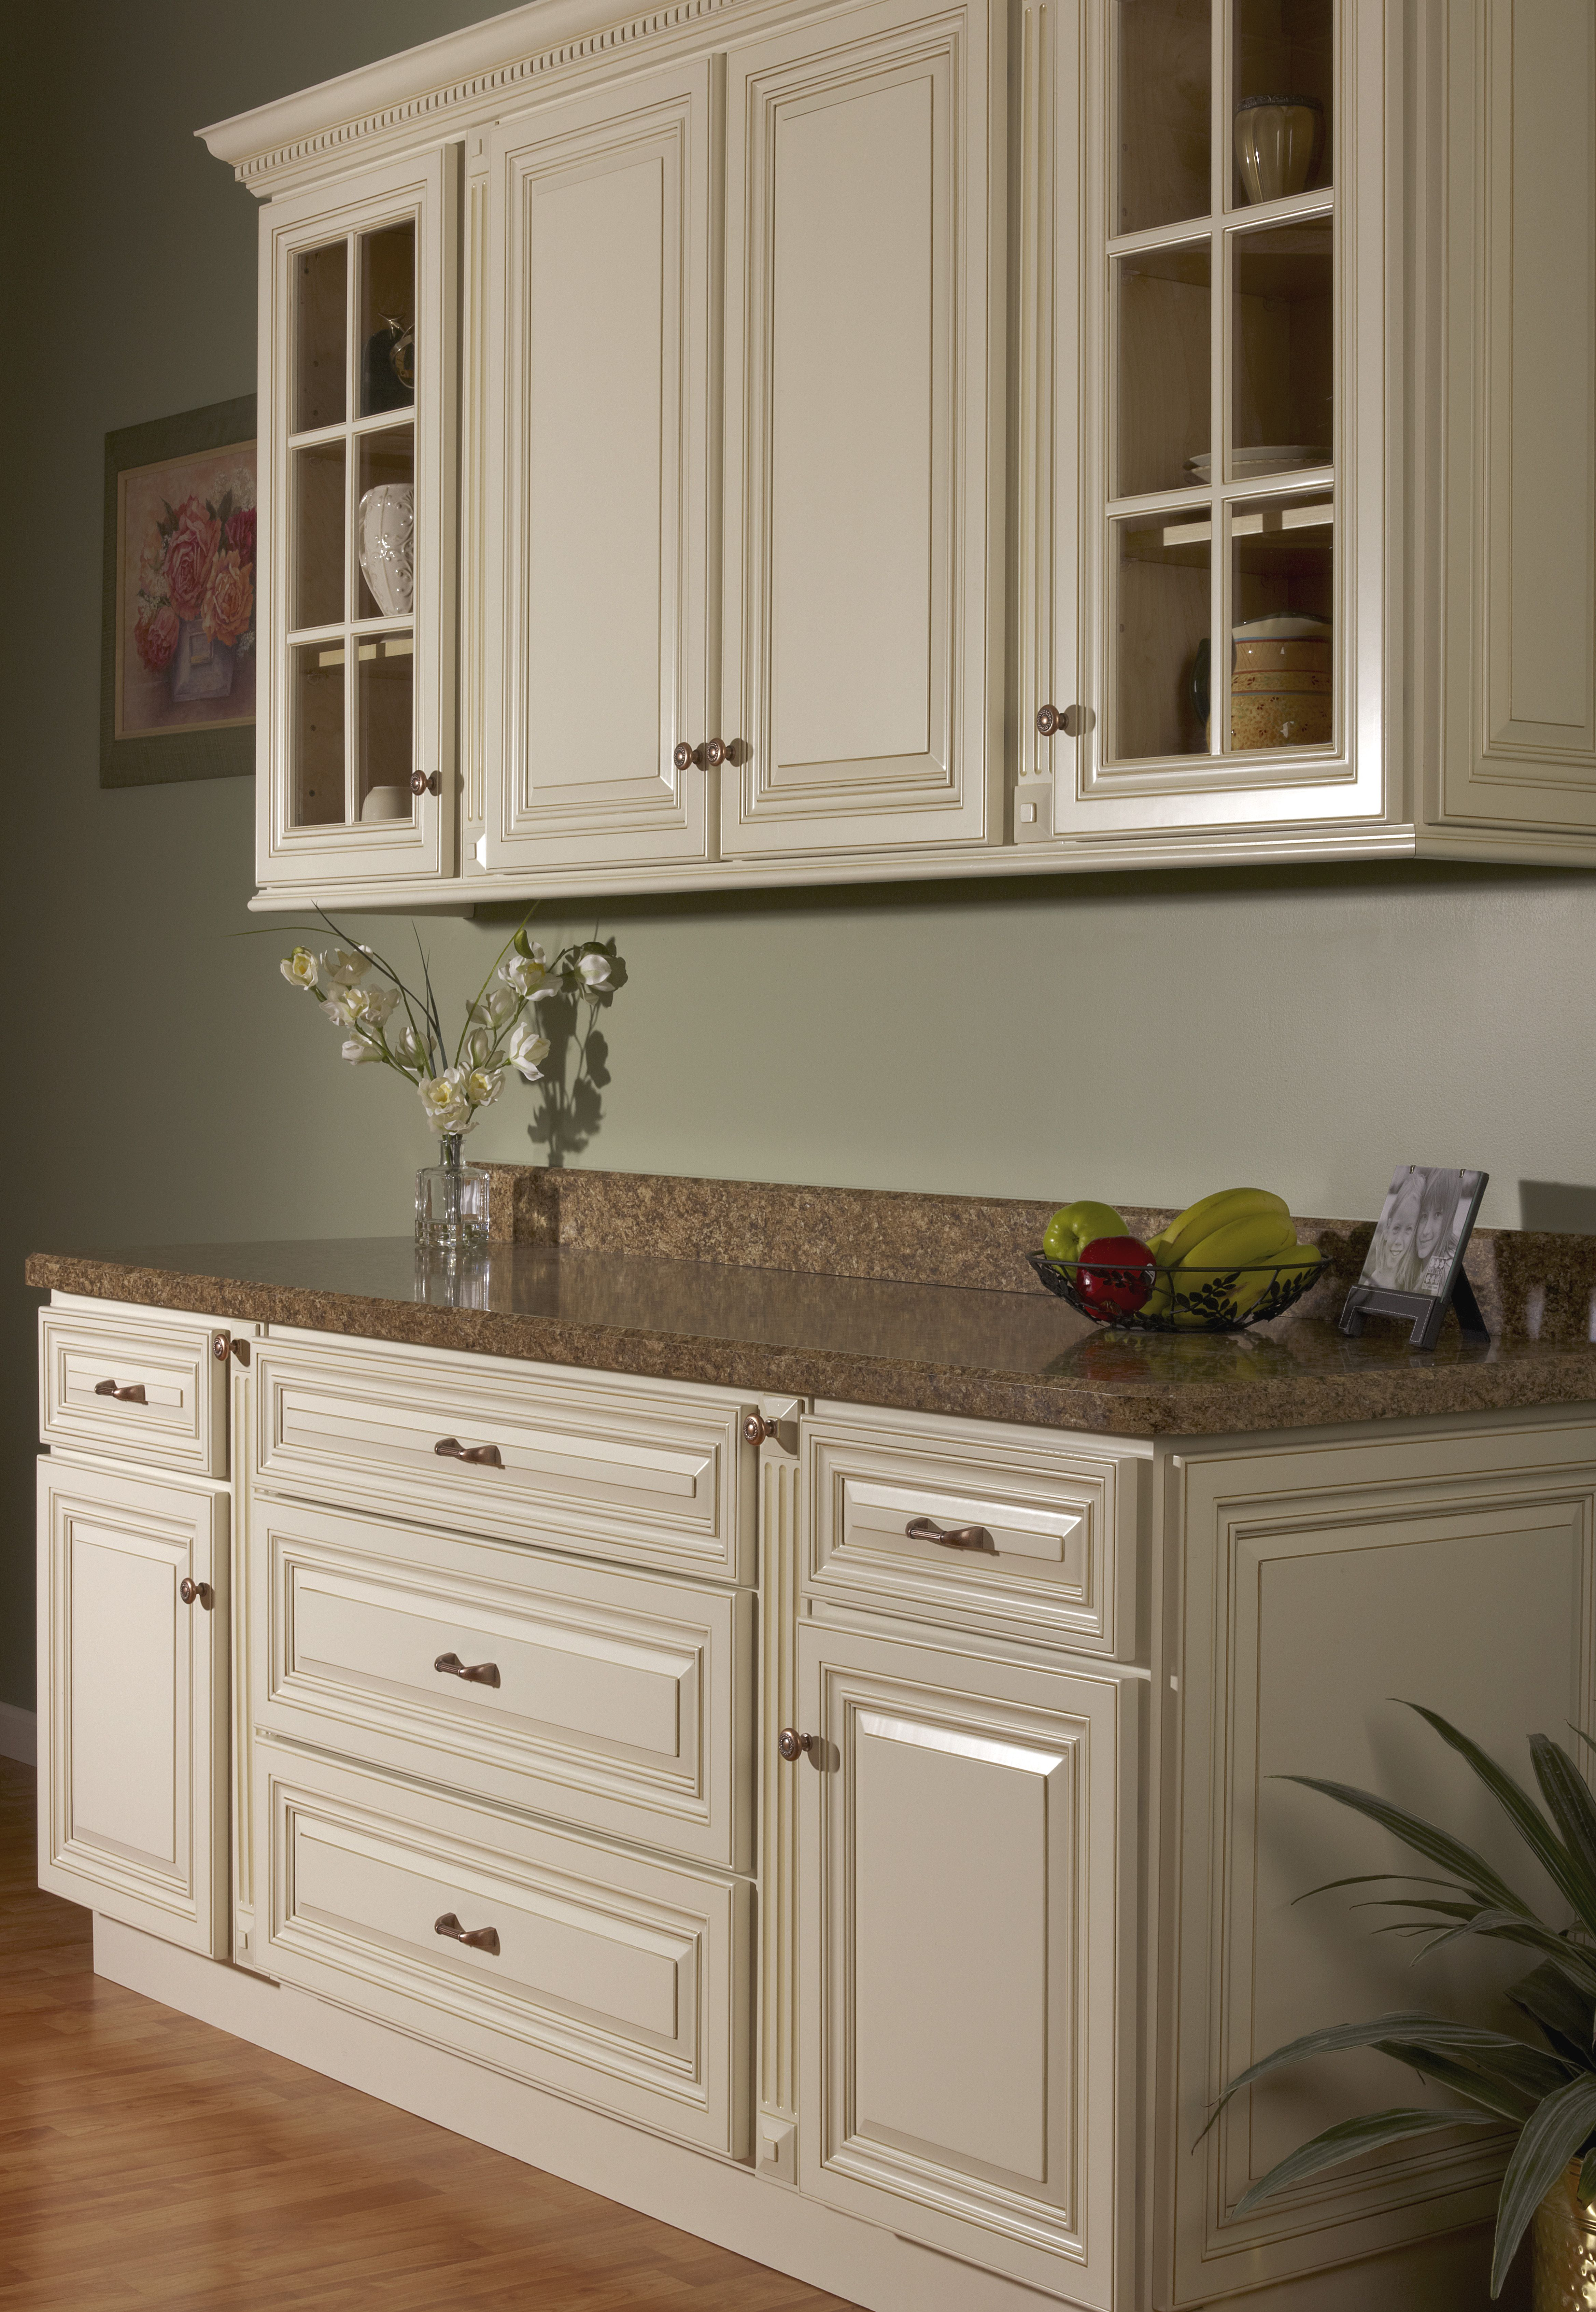 Vanilla Bean Glaze Kitchen Cabinetry Sold At Innovations Kitchen Remodel Small New Kitchen Cabinets Antique Kitchen Cabinets